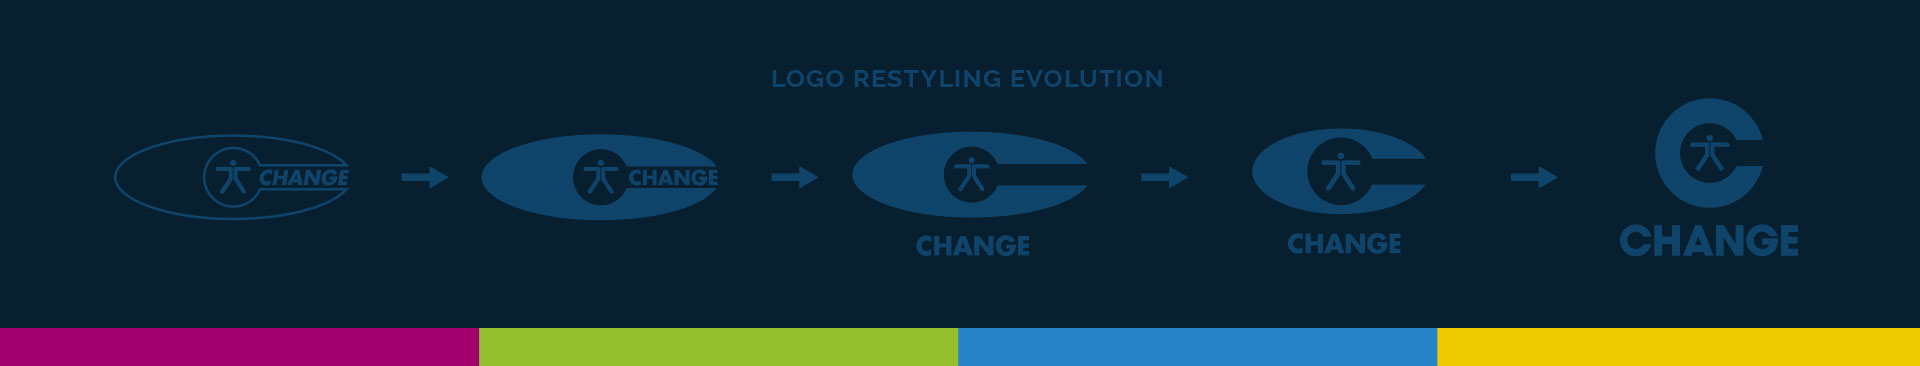 change-project-logo-evolution-zerouno-design